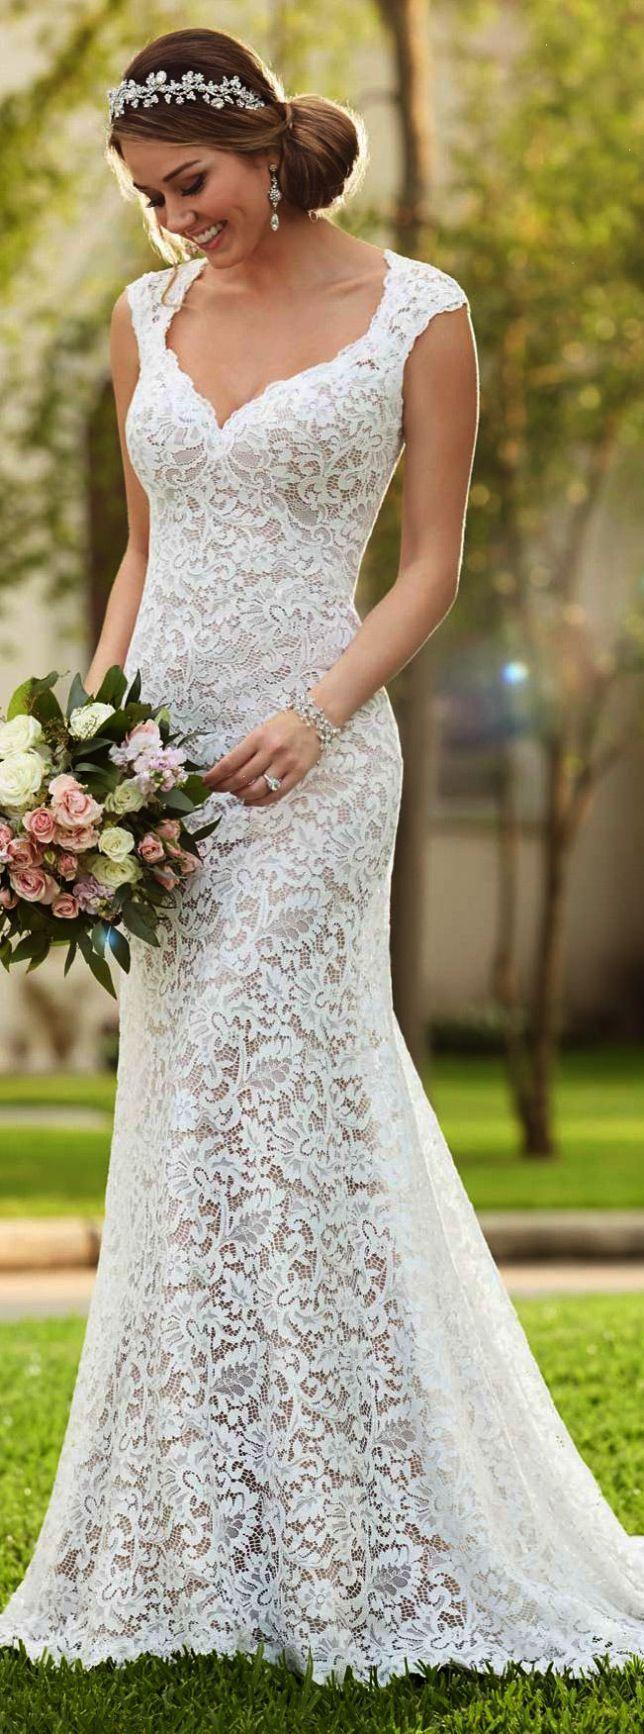 No way boho lace wedding dress long sleeve twitter wedding